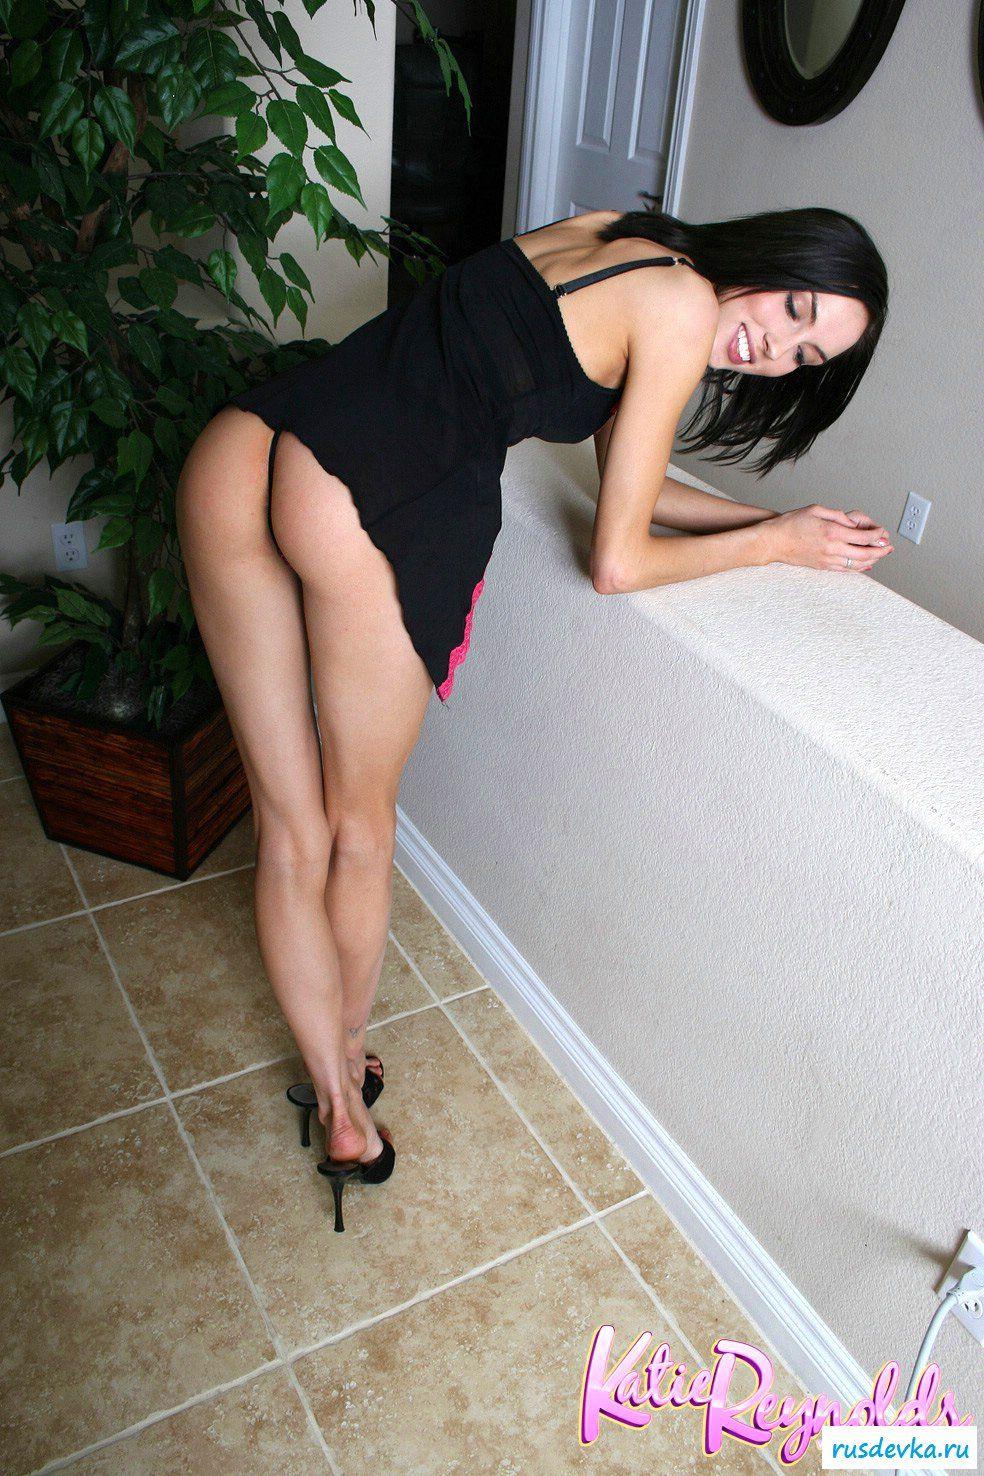 Брюнетка готова к классному сексу